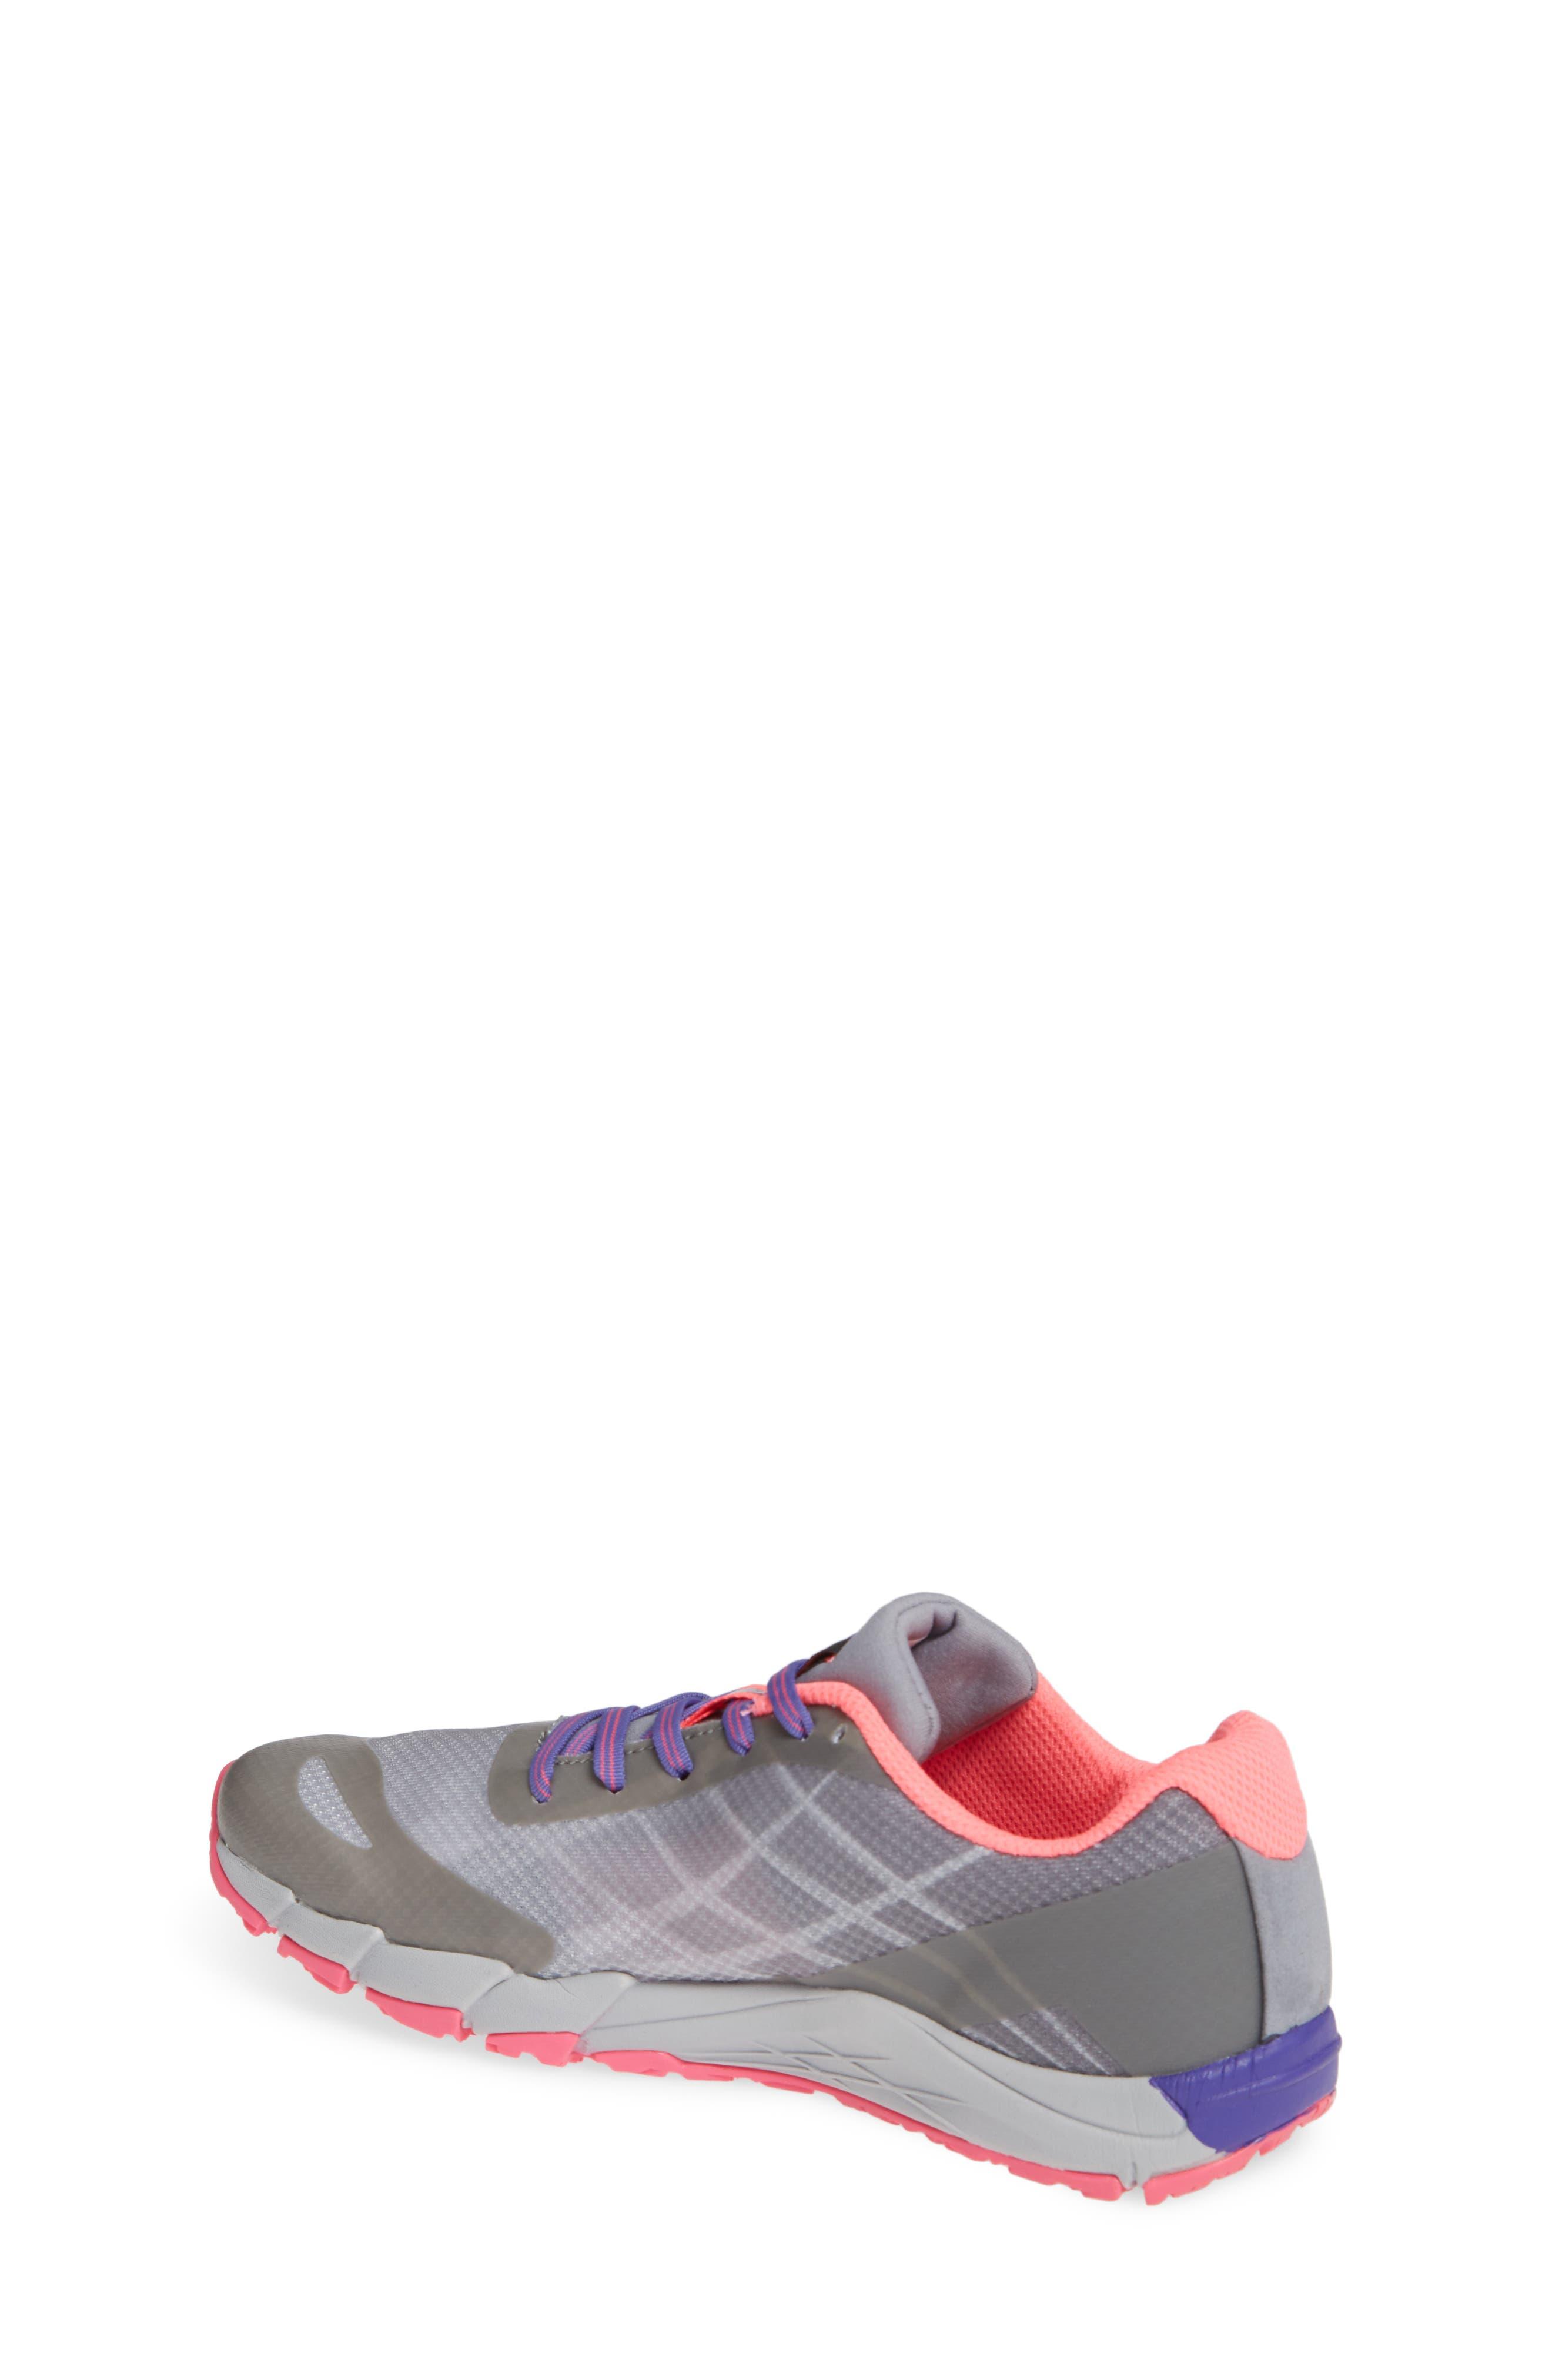 MERRELL, Bare Access Sneaker, Alternate thumbnail 2, color, GREY/ MULTI SYNTHETIC